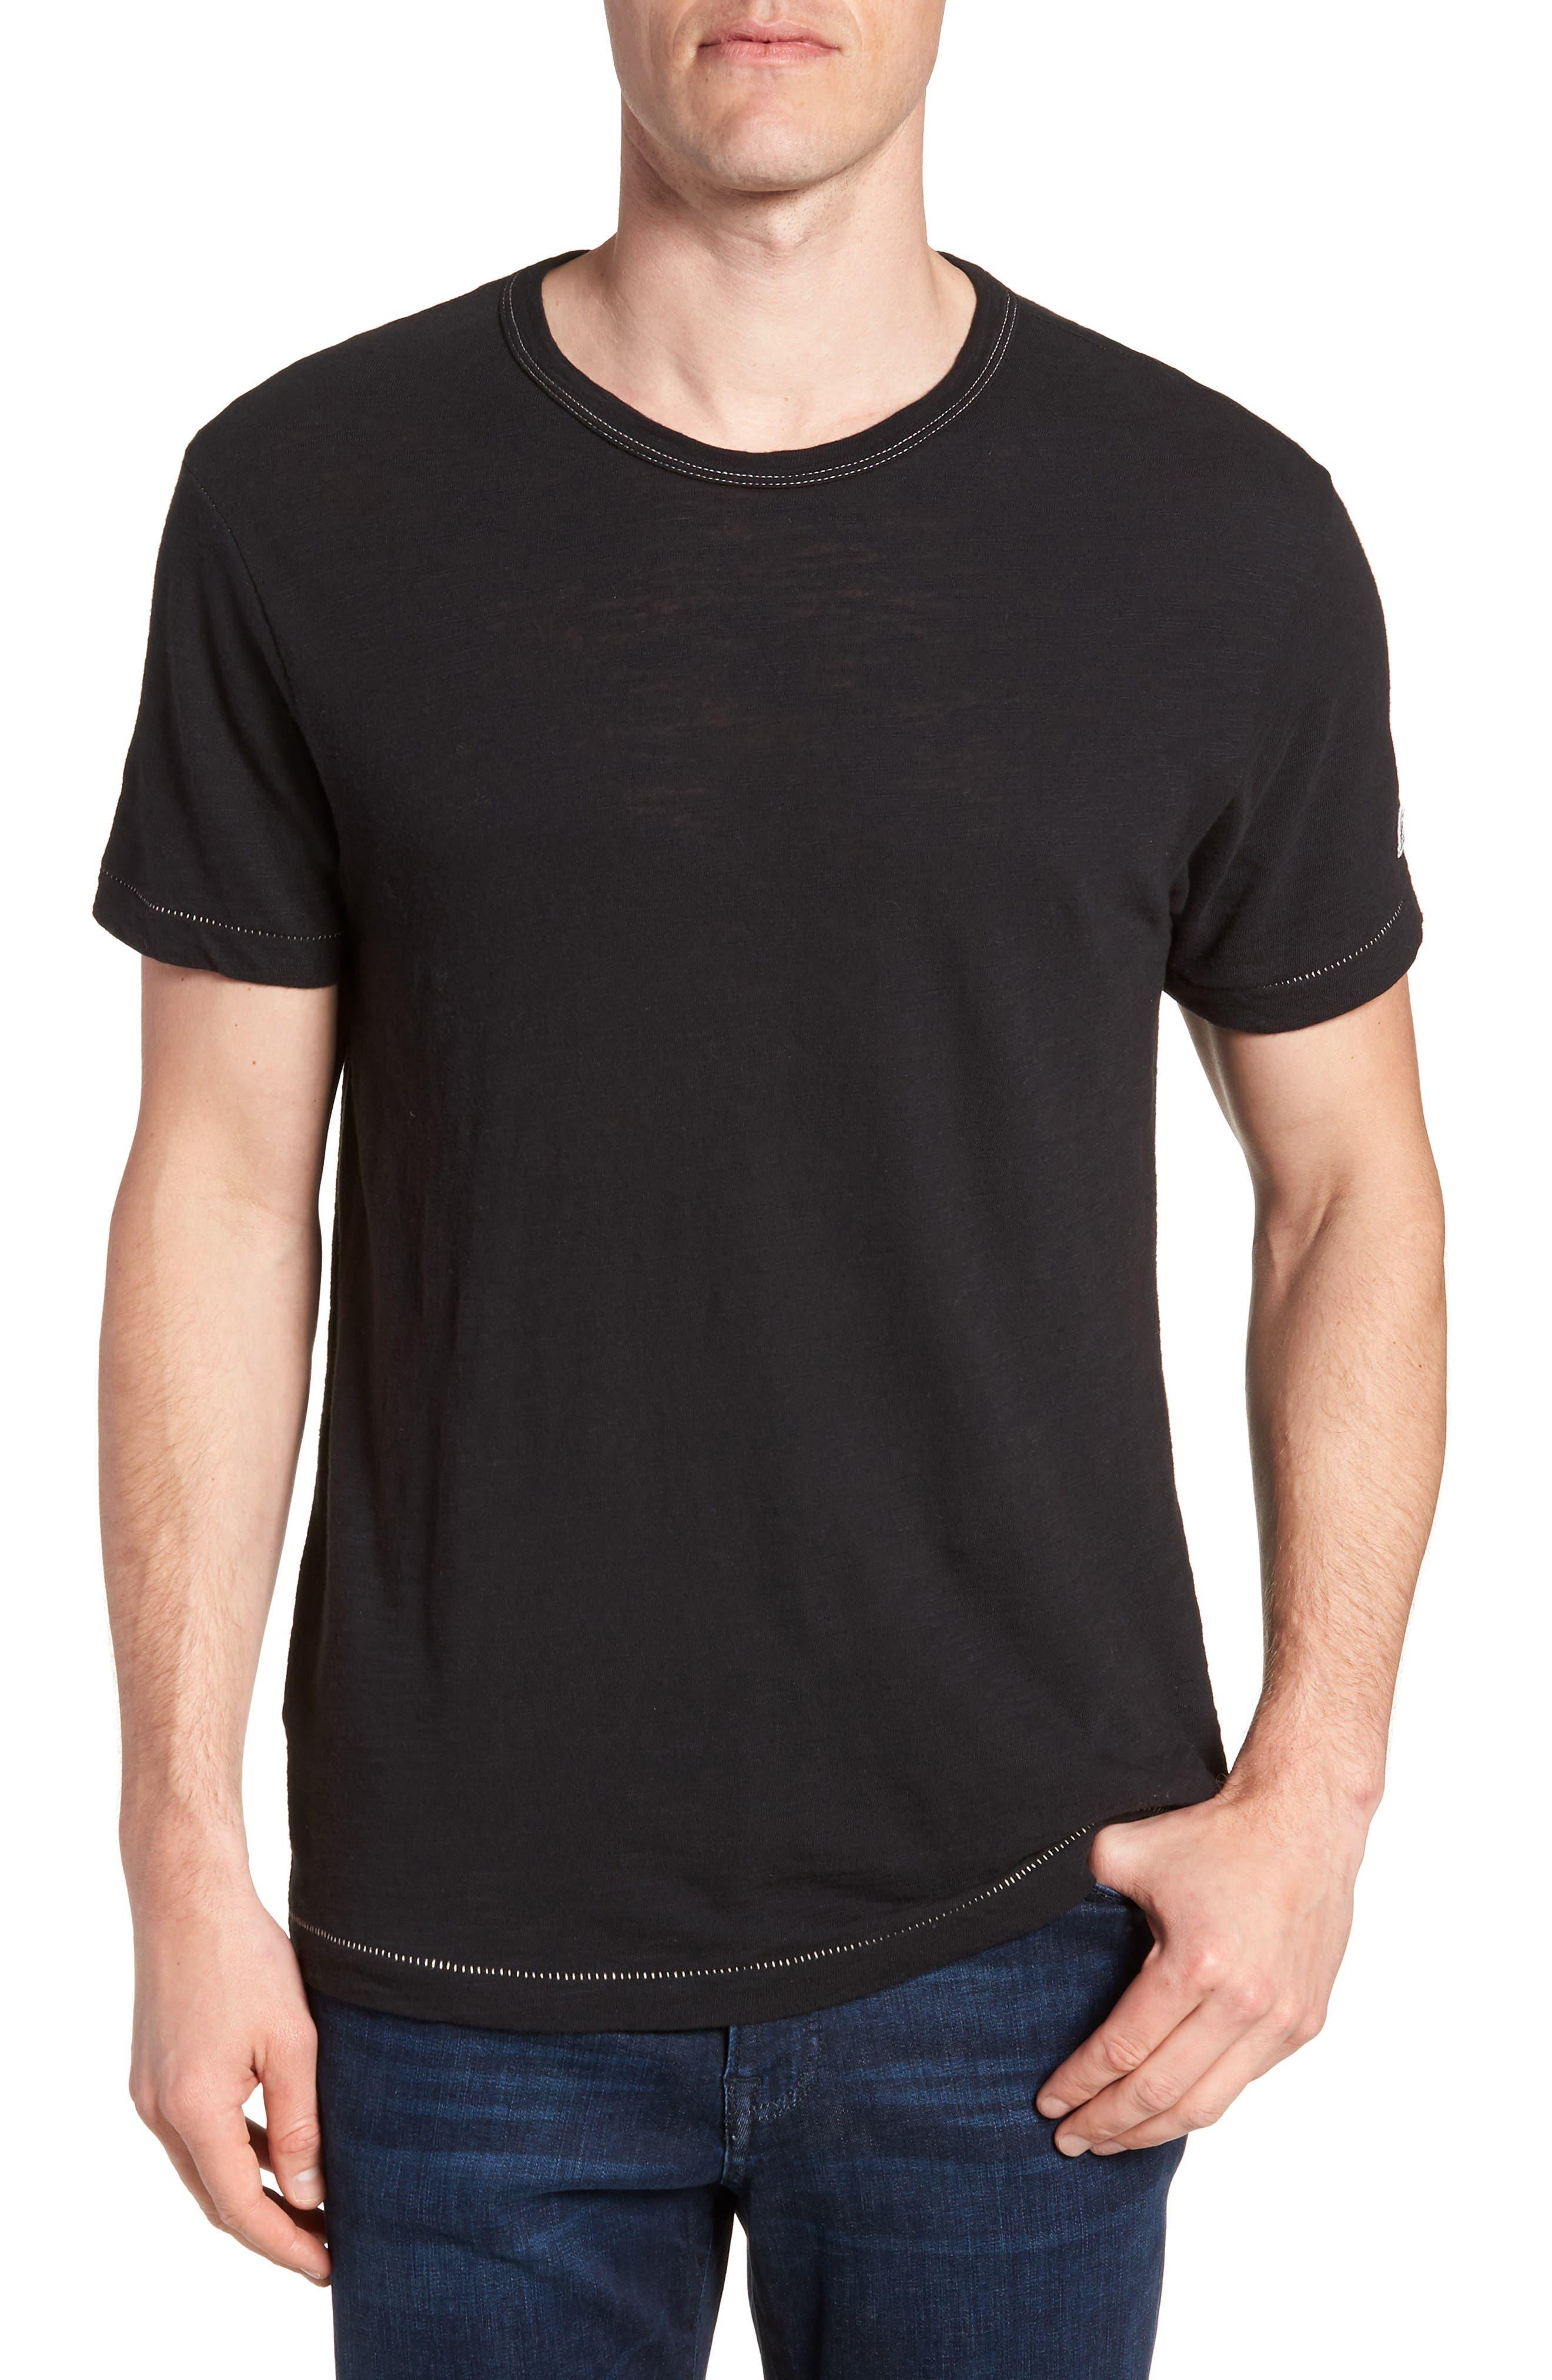 + Champion T-Shirt,                             Main thumbnail 1, color,                             Black